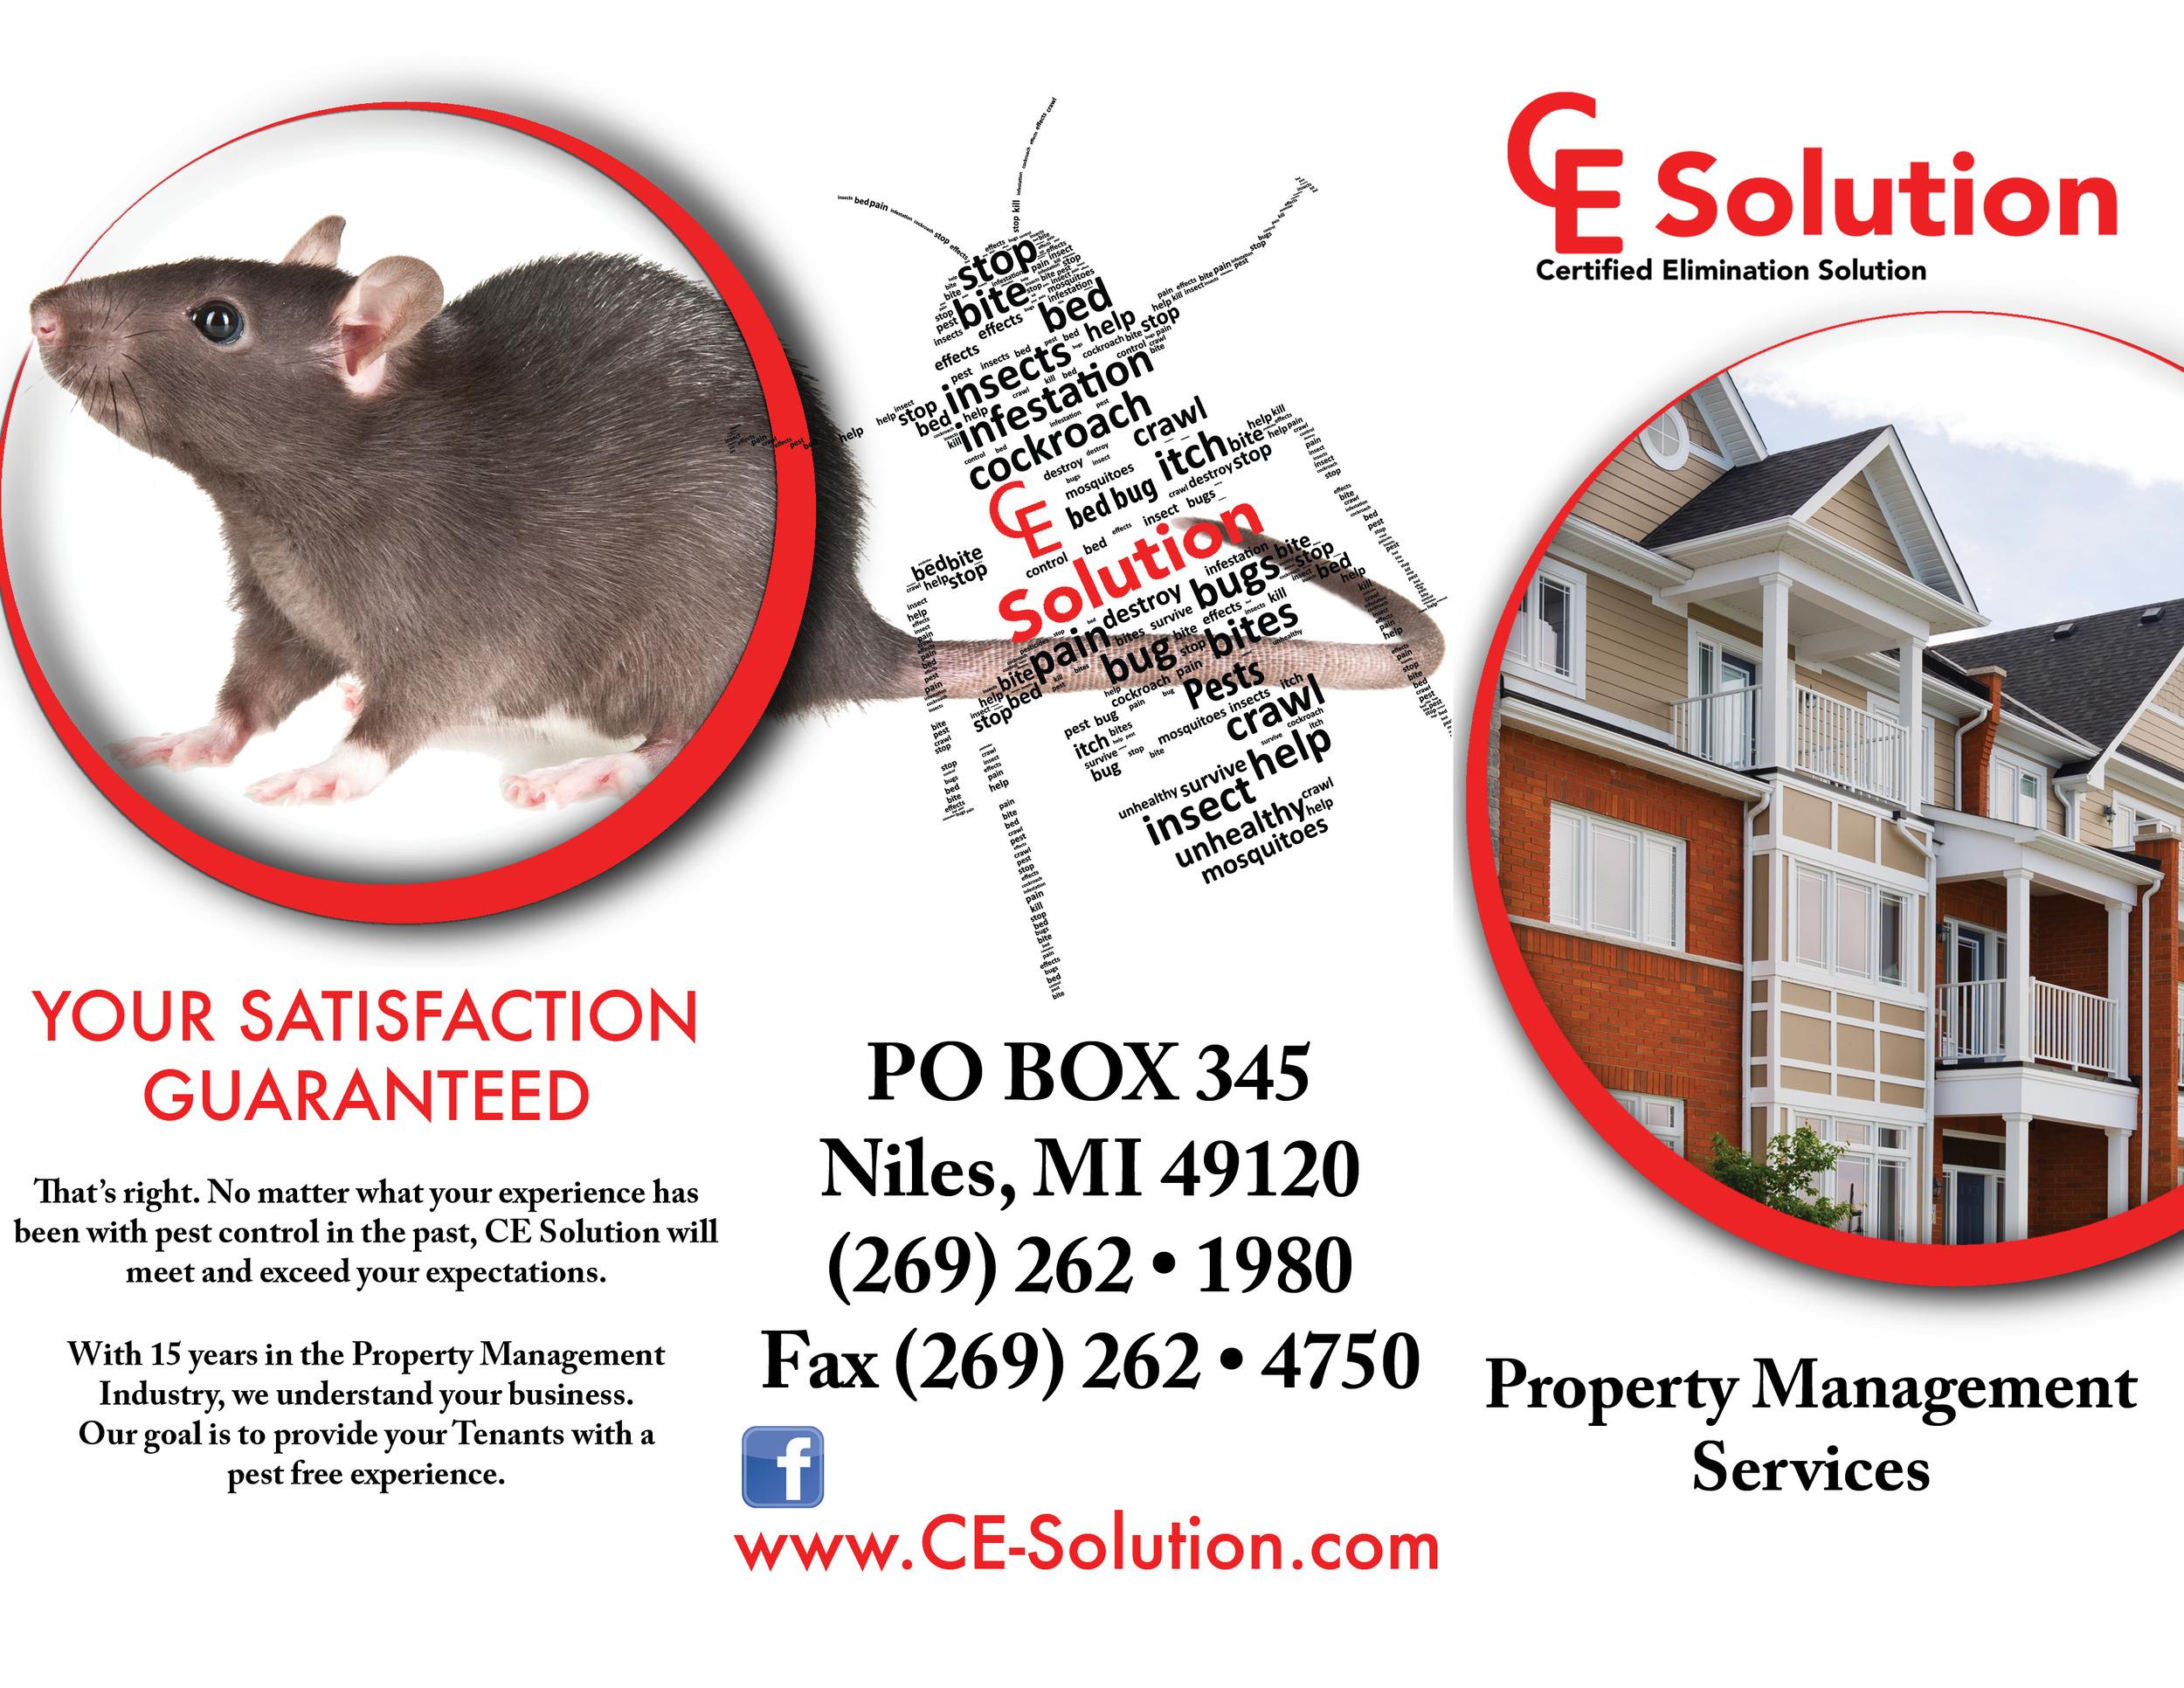 CE brochure property management update.jpg